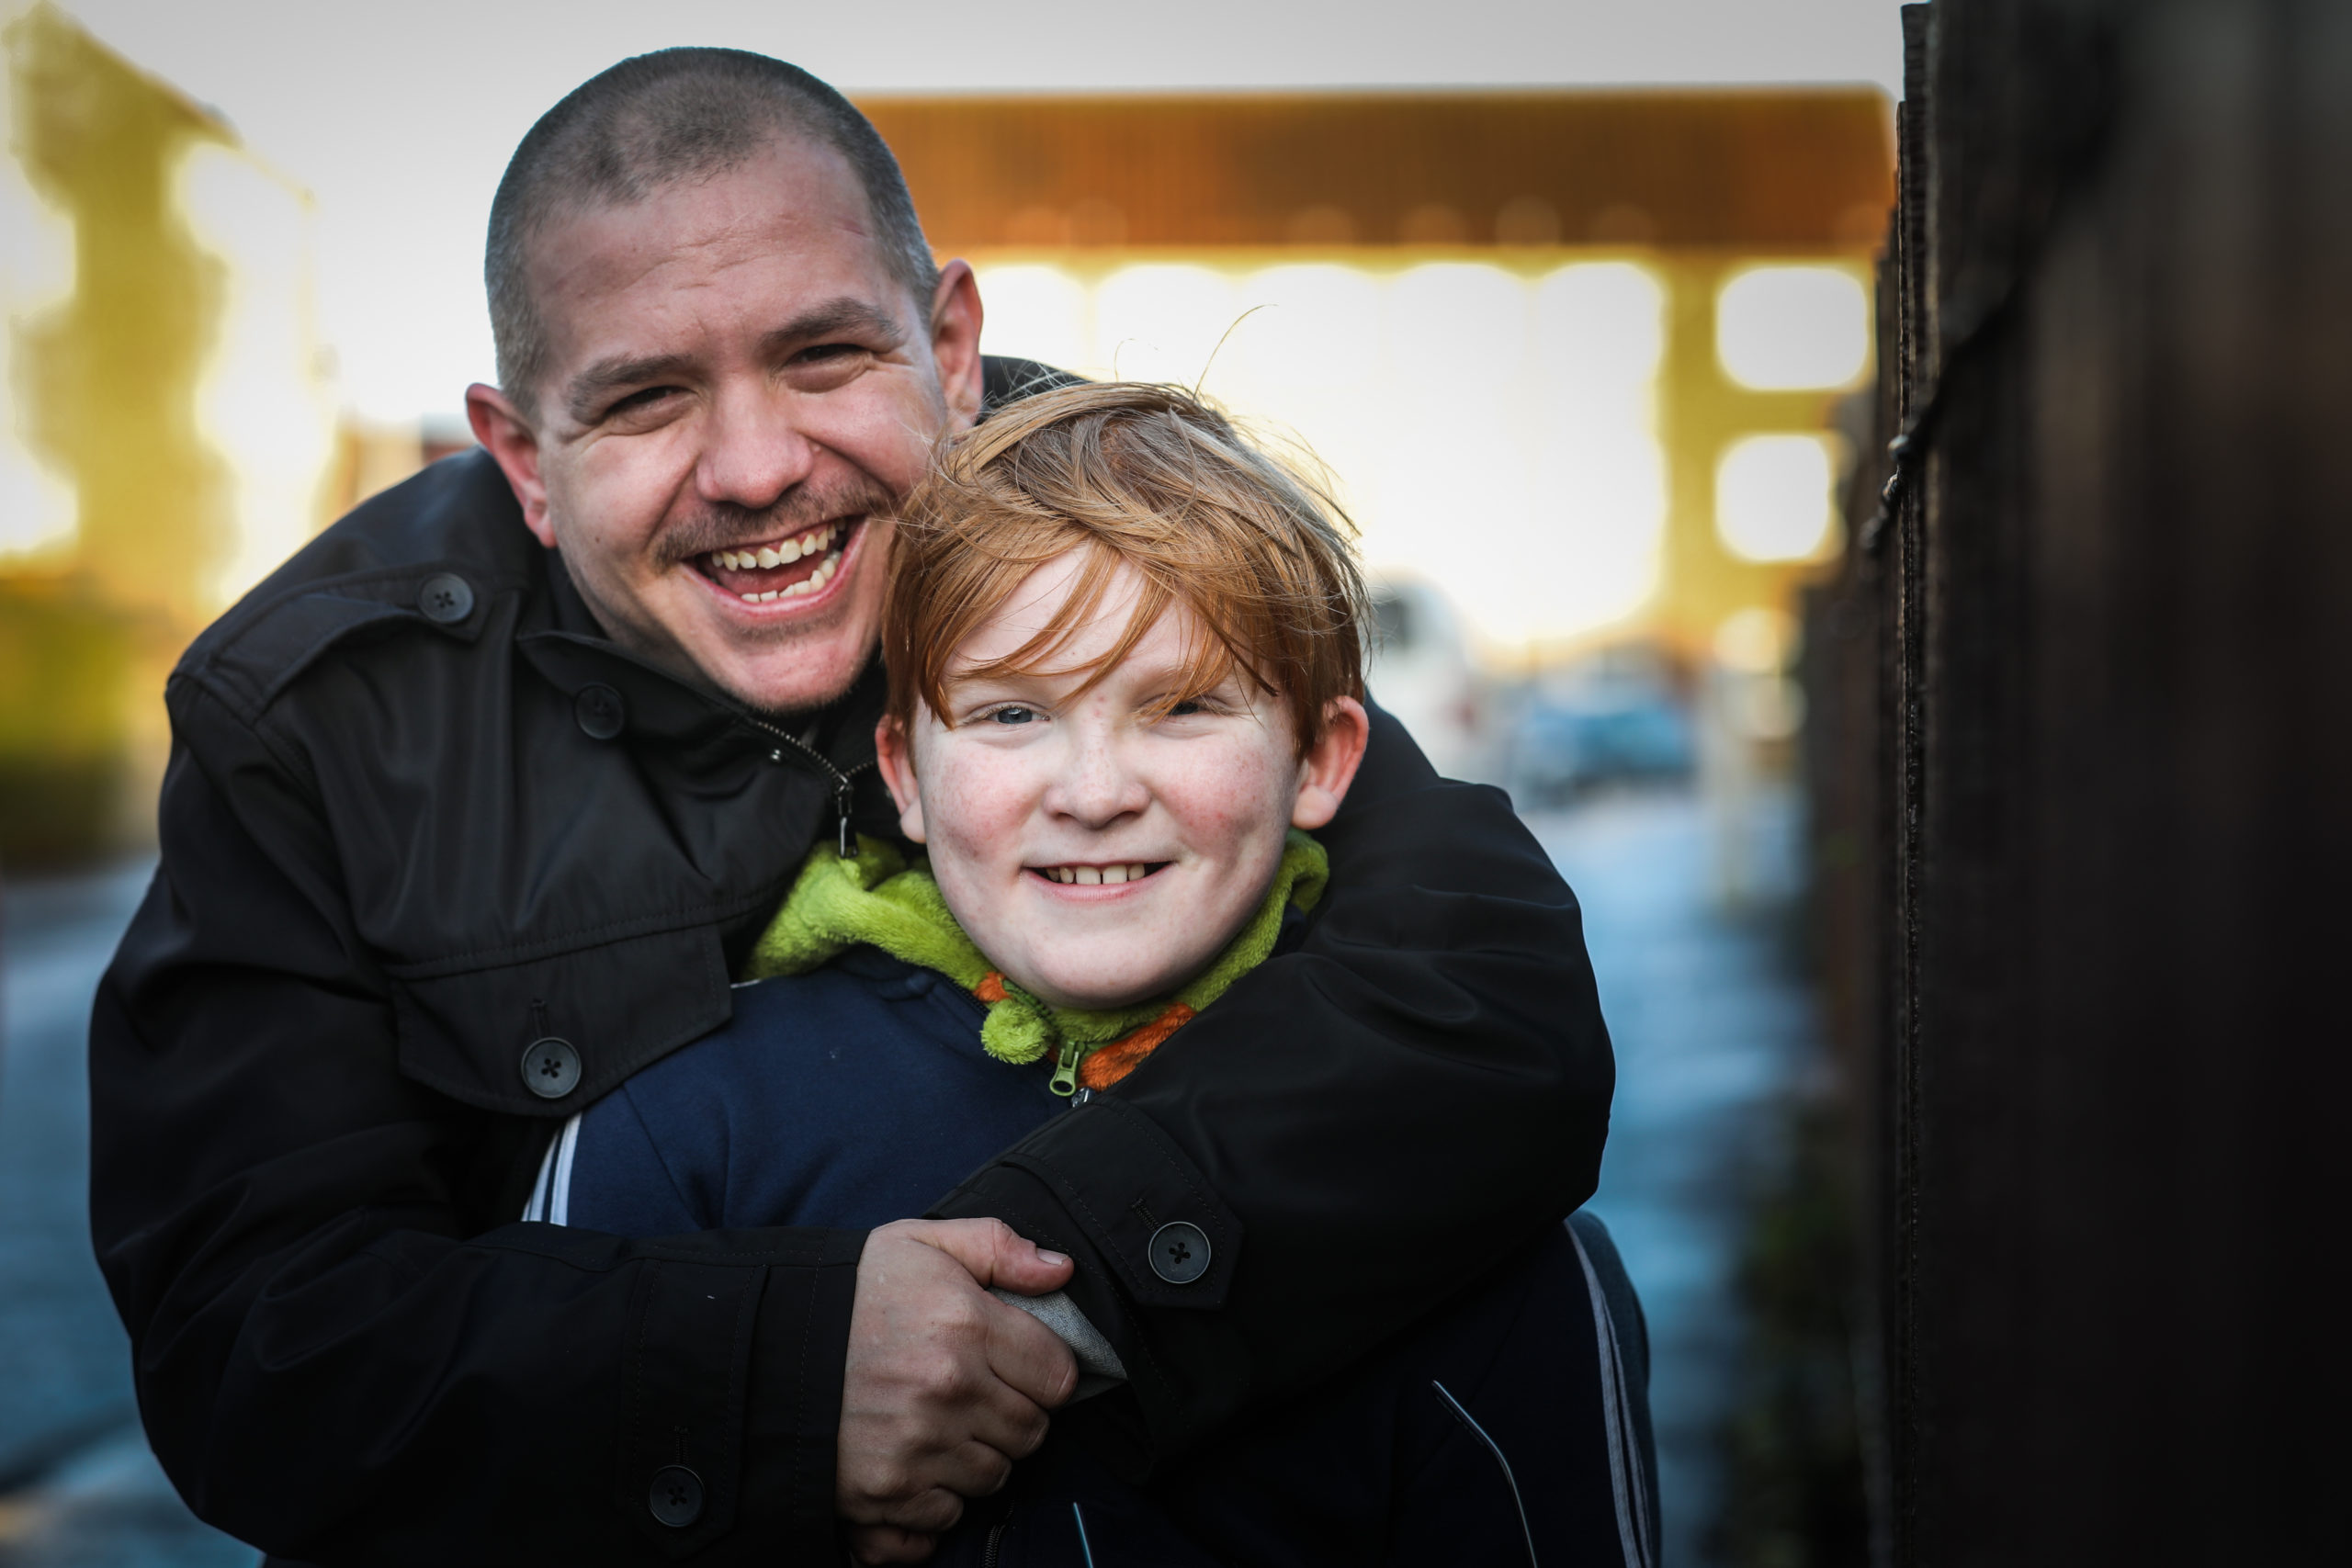 James McMahon, 11 and his stepdad Arthur Adlam.